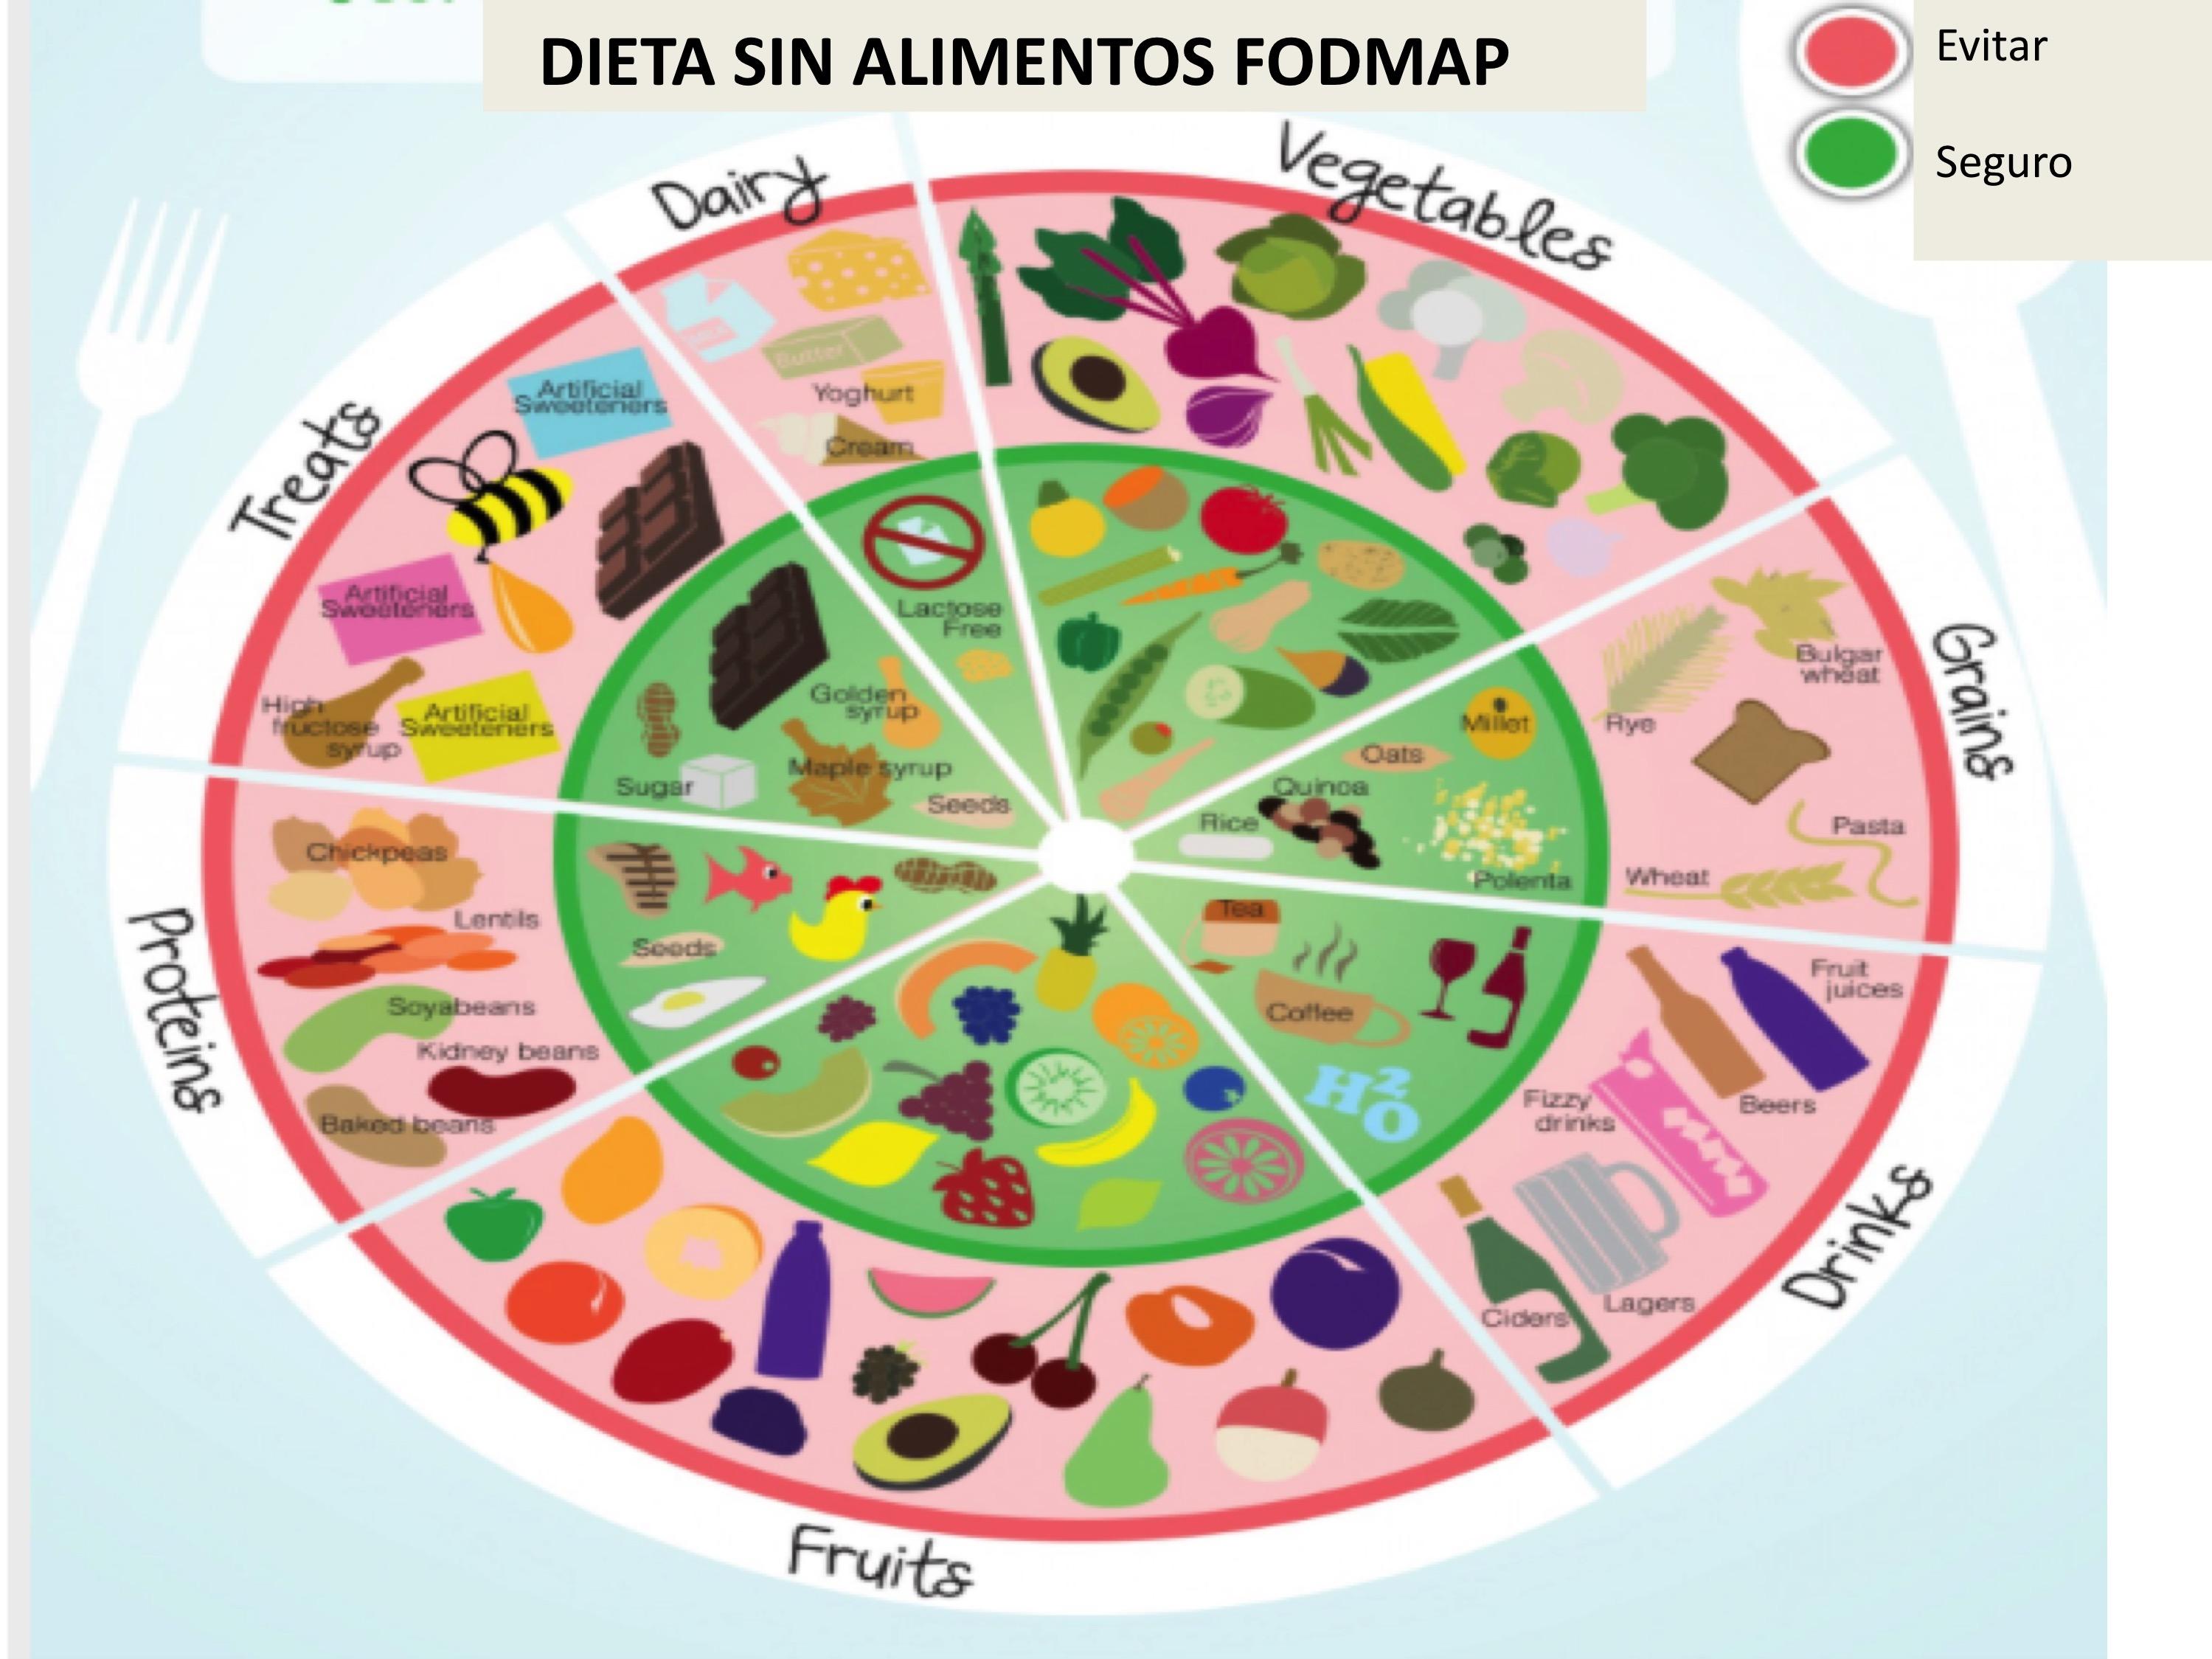 Colonoscopia dieta a seguir en ingles